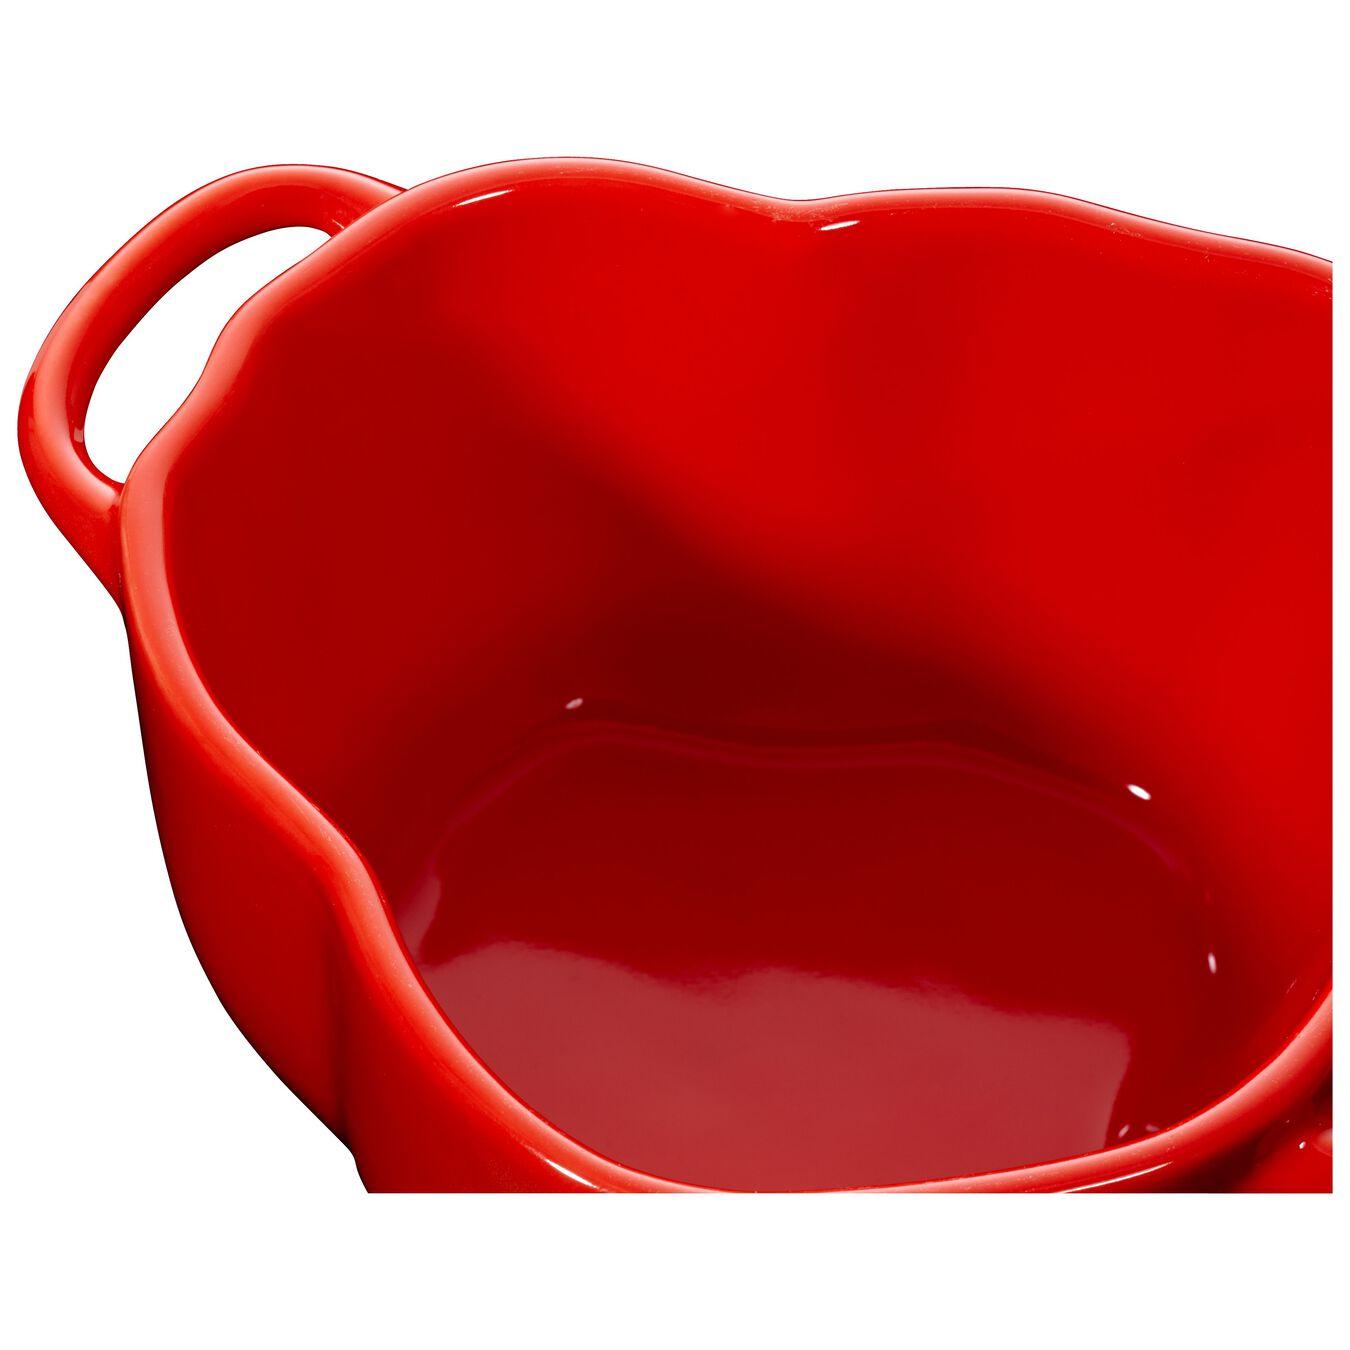 Cocotte 12 cm, pepper, Orange-Red, Céramique,,large 4